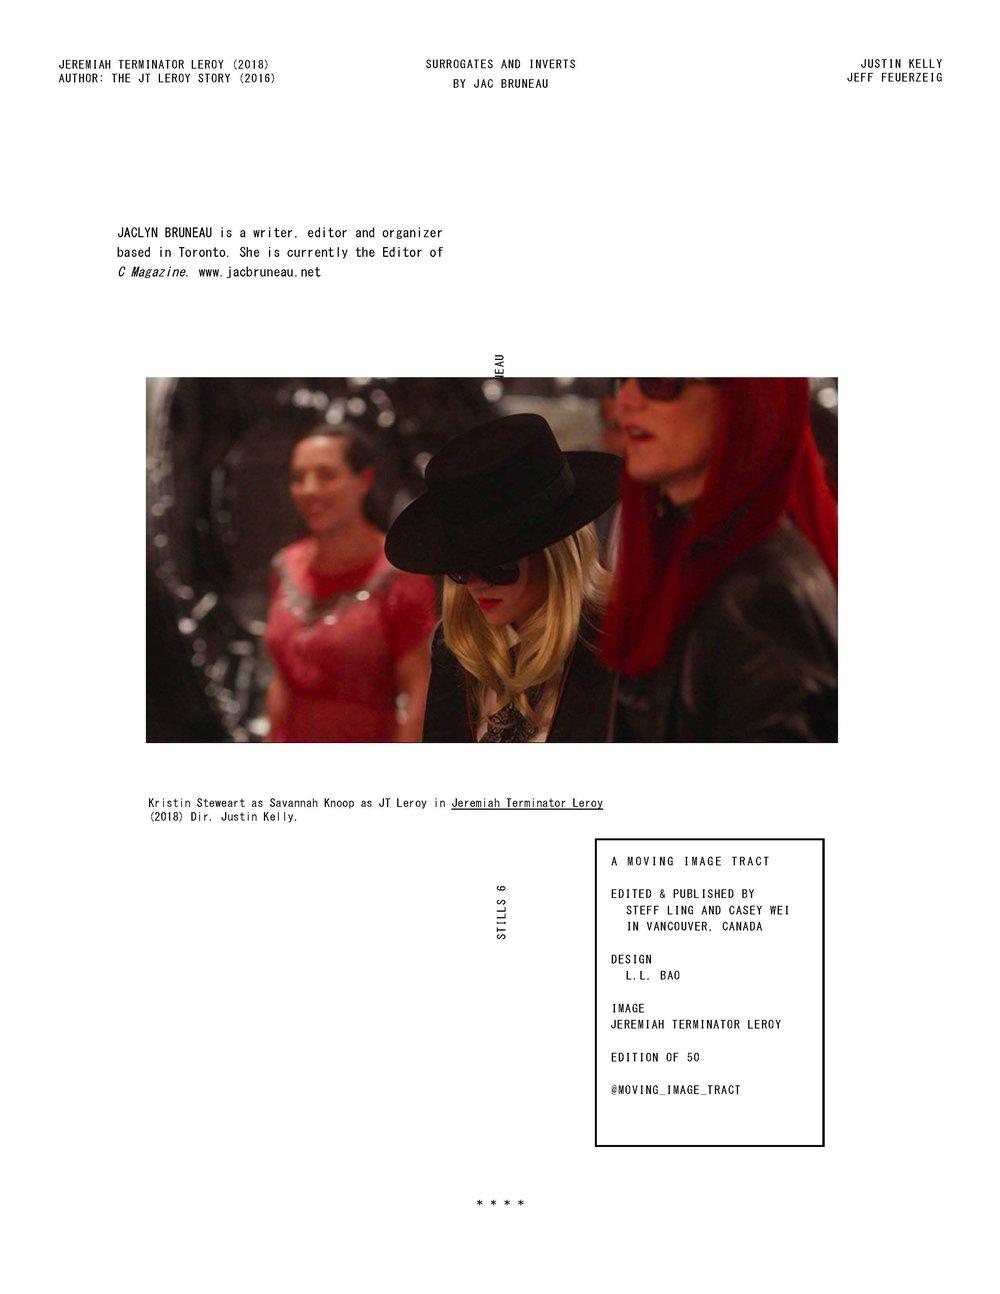 jpeg full final_Page_4.jpg